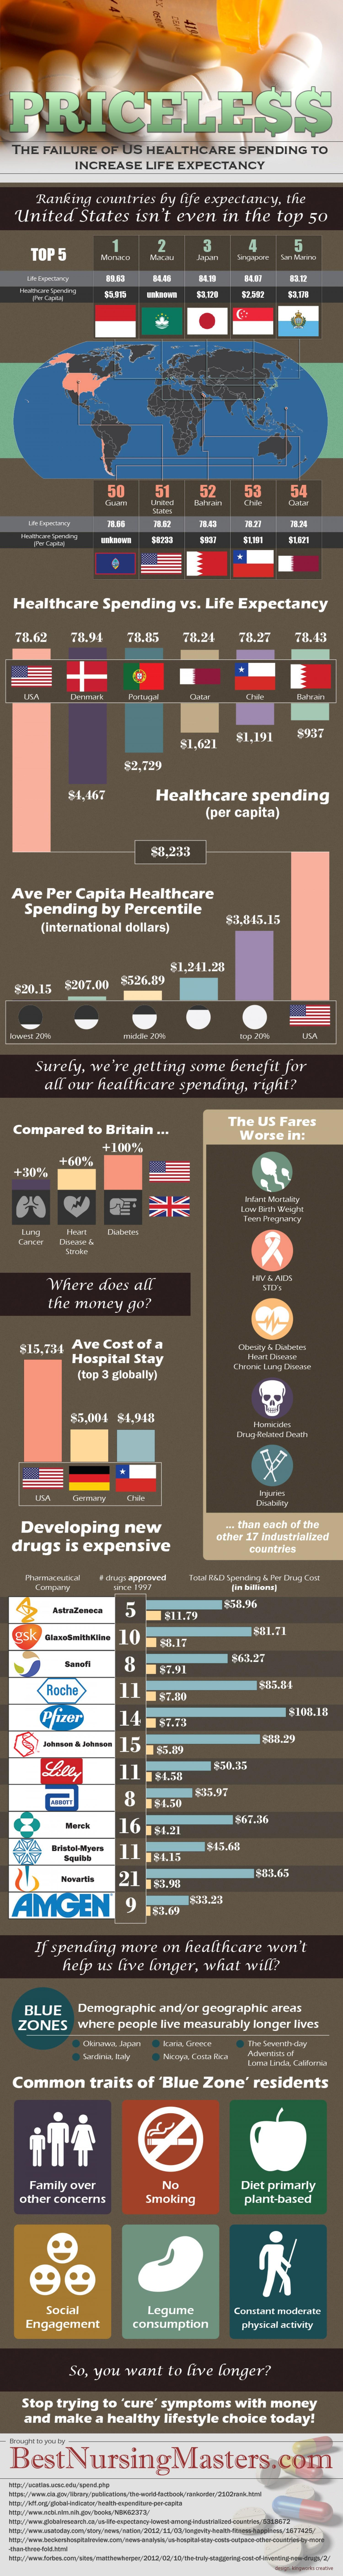 us-healthcare-spending_5319b1269d75f_w1500